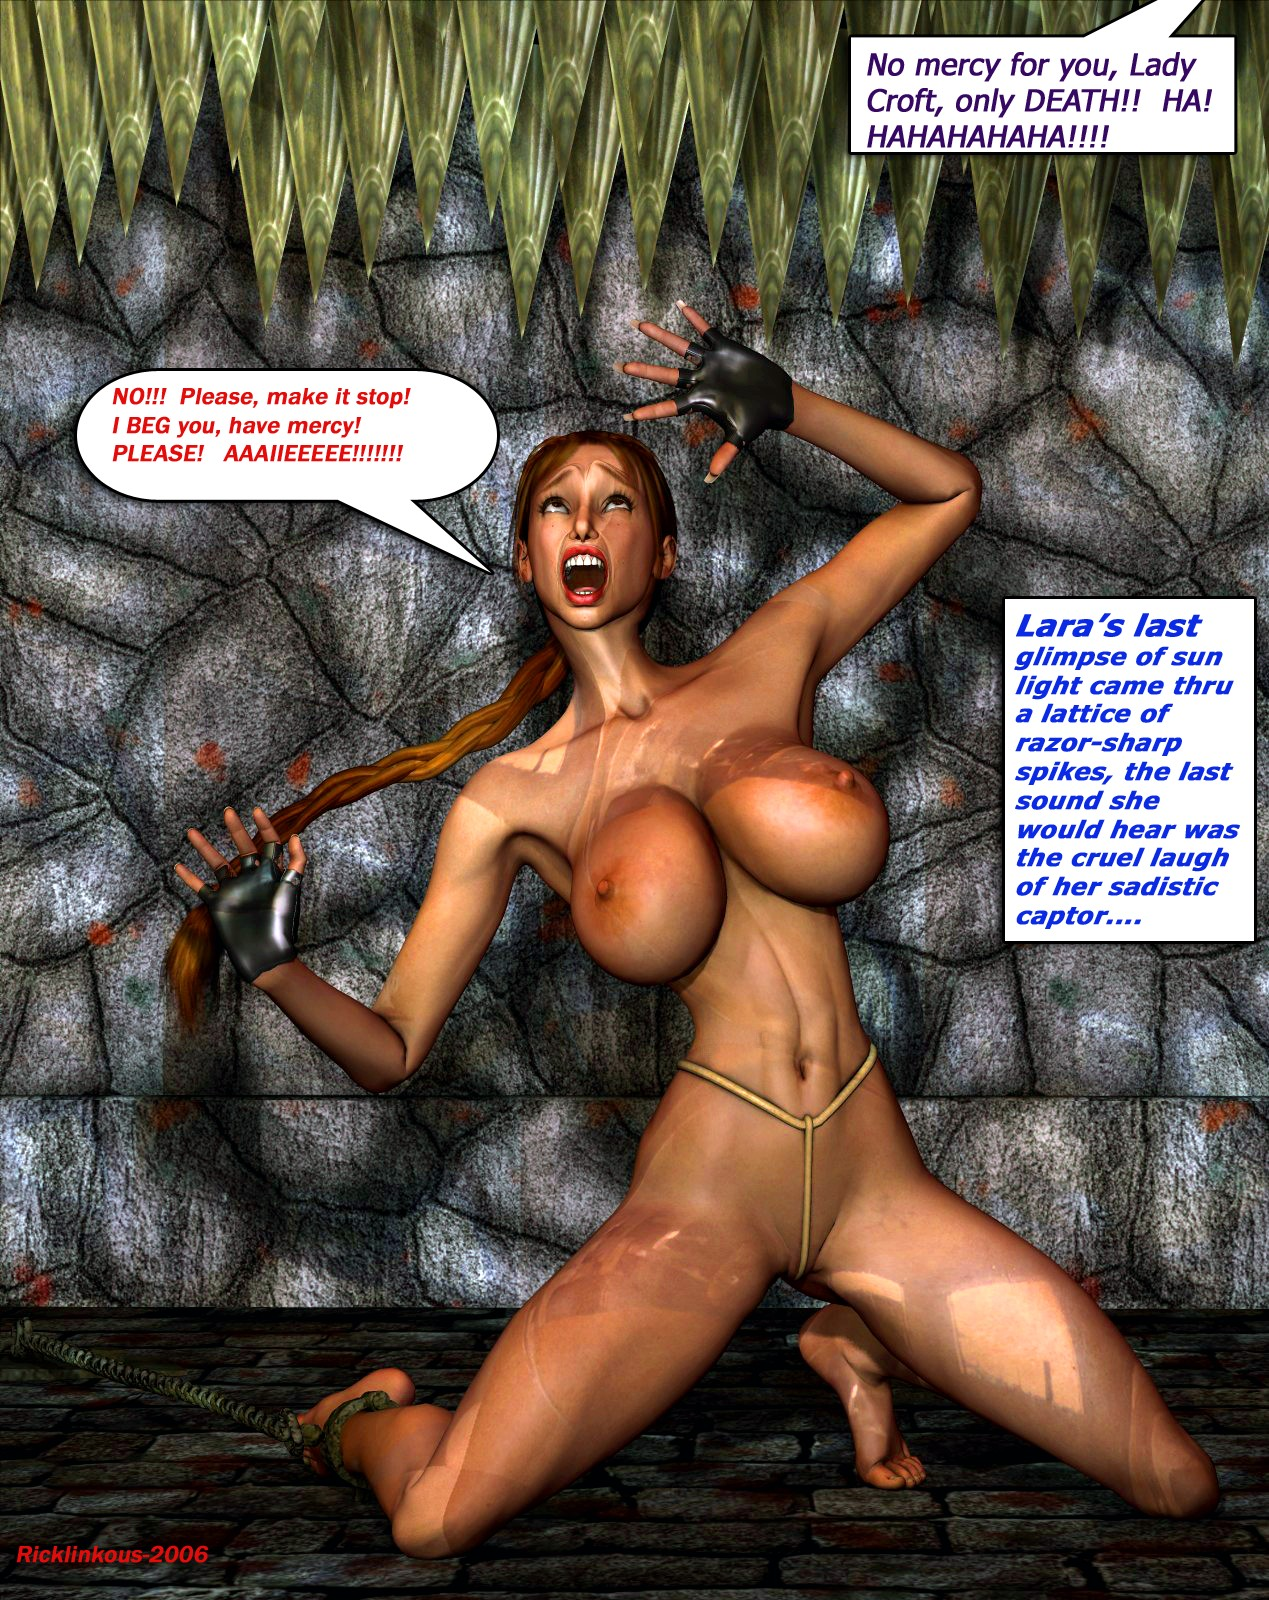 Lara croft nackt sex videos naked movies